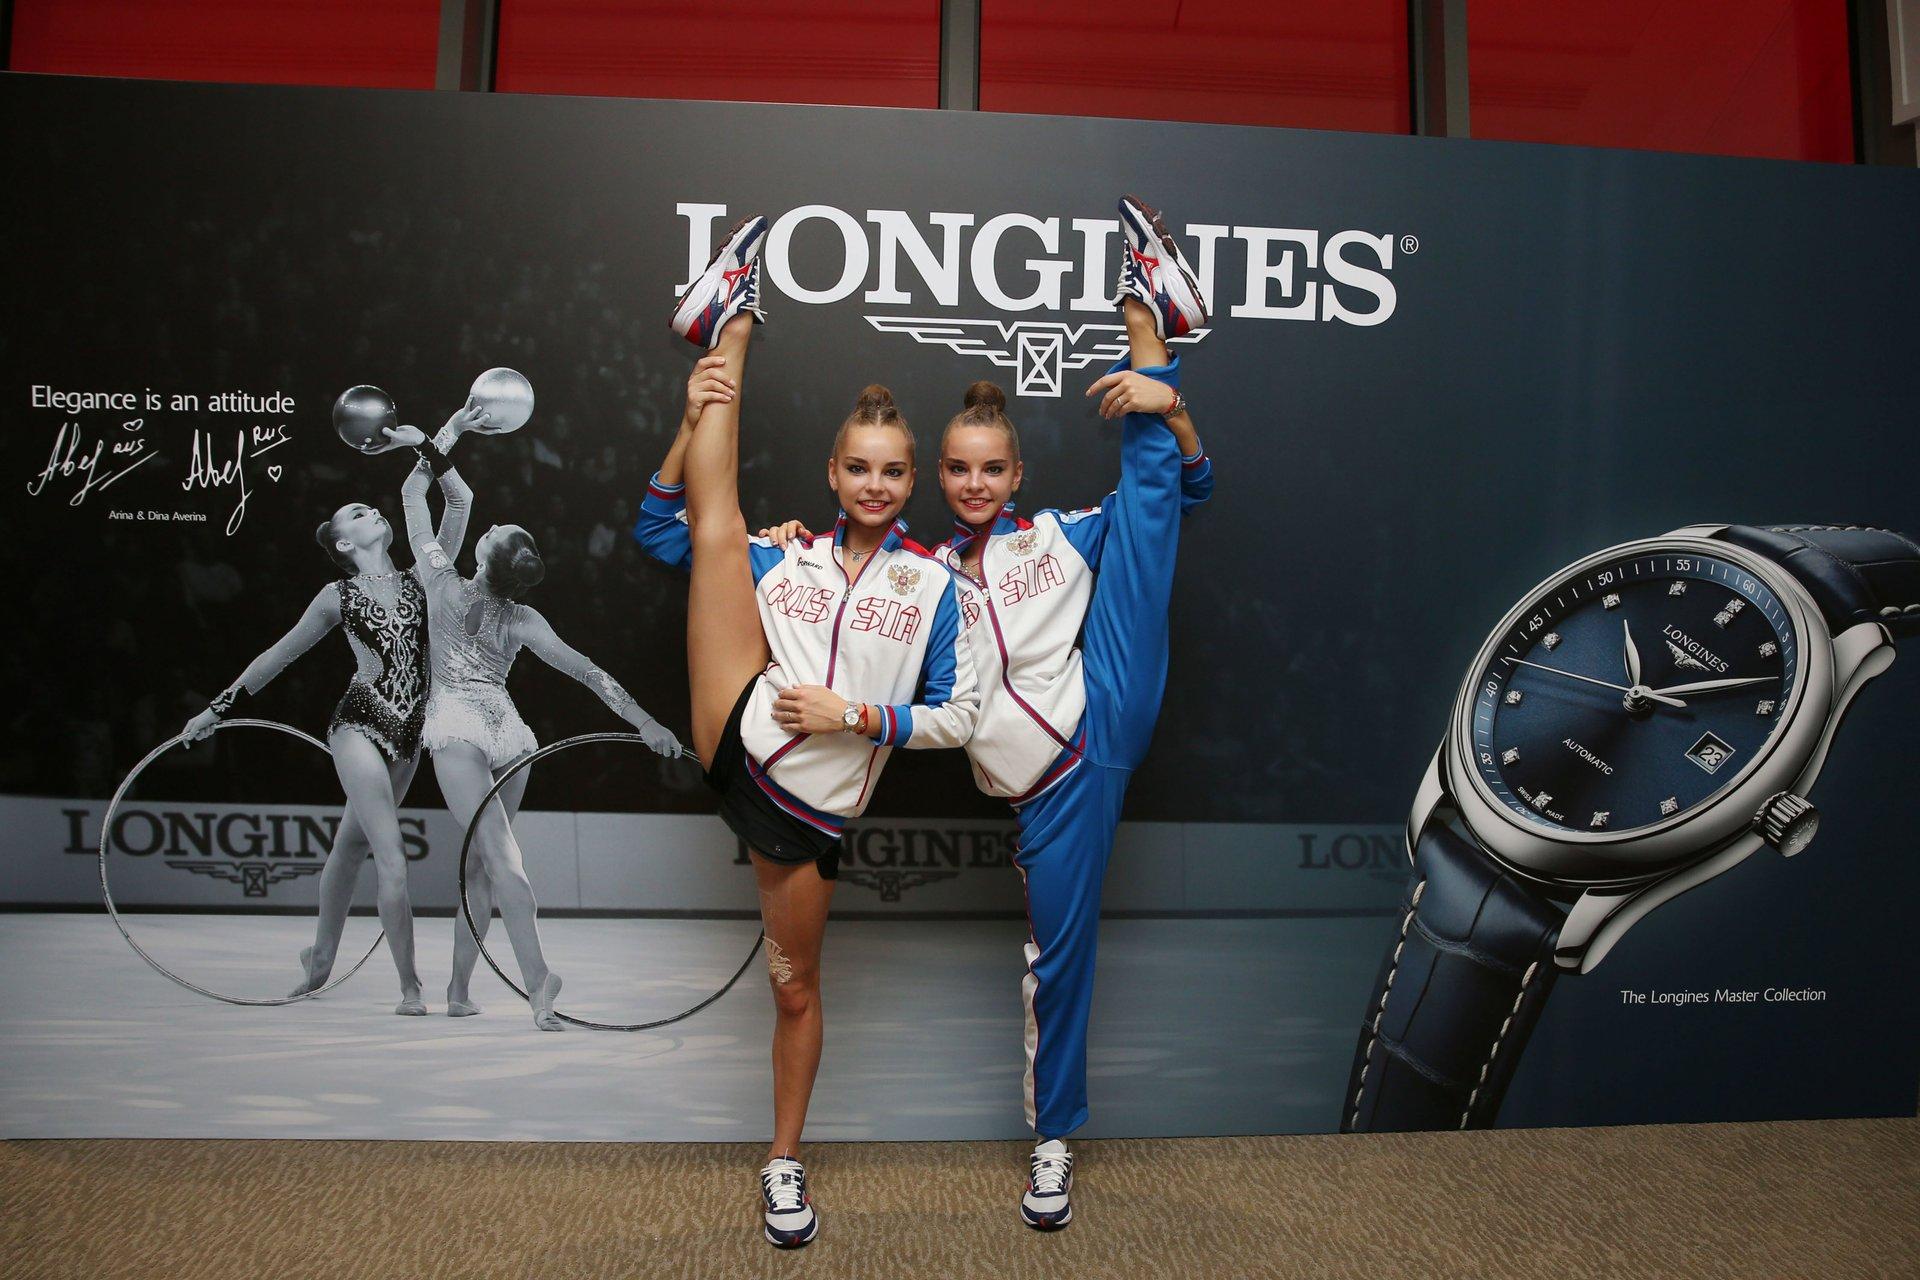 Longines Ambassadors of Elegance Arina and Dina Averina